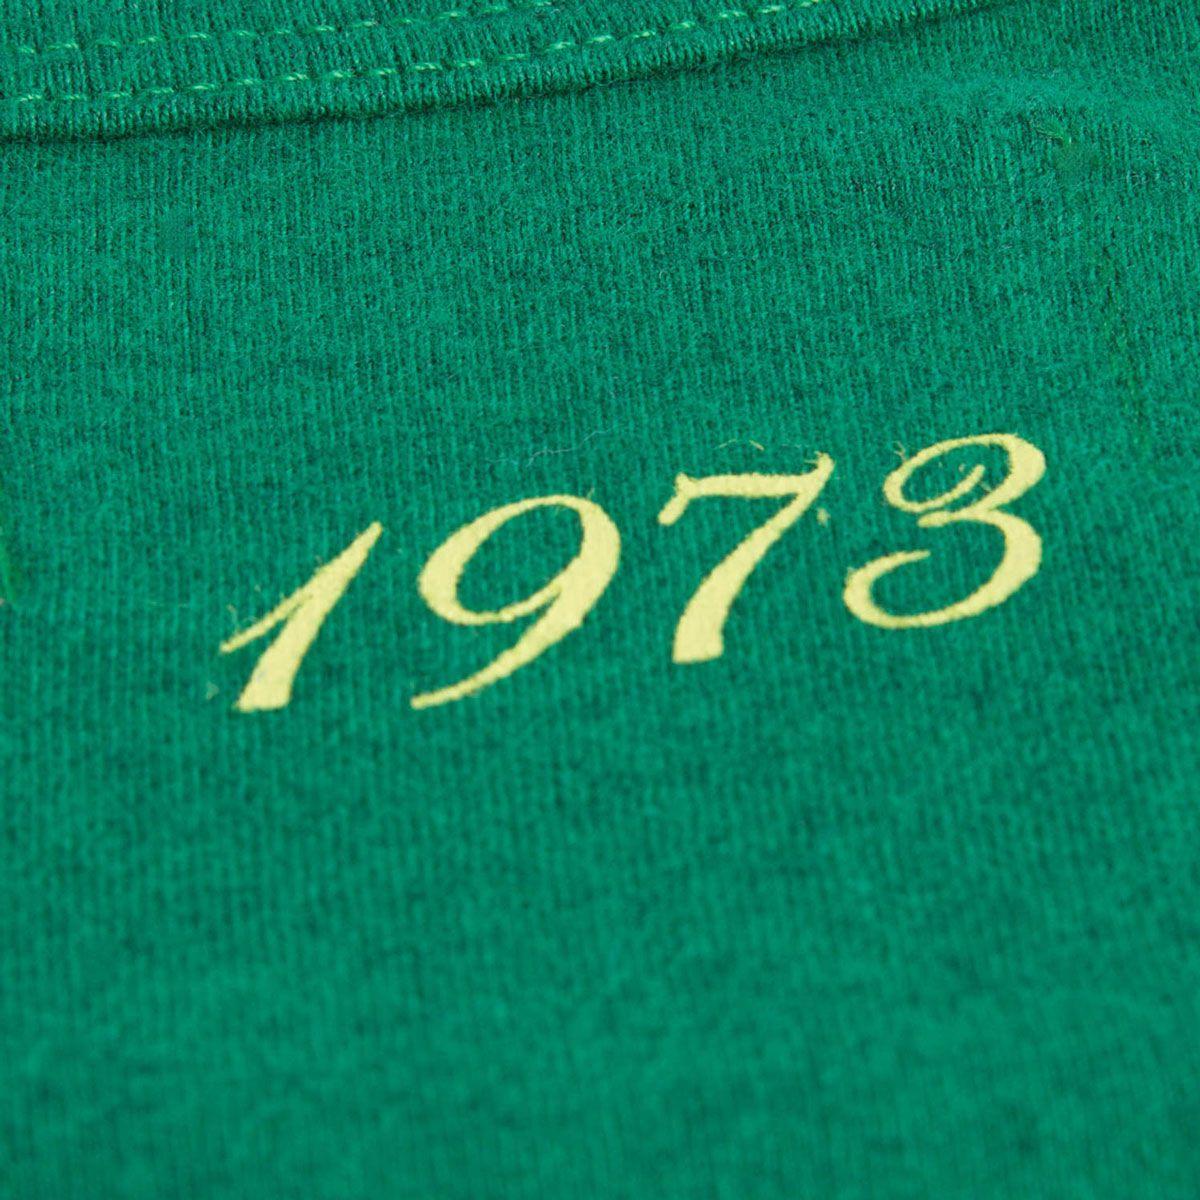 Regata Mescla Retrô Gol Torcedor Chapecoense 1973 Verde